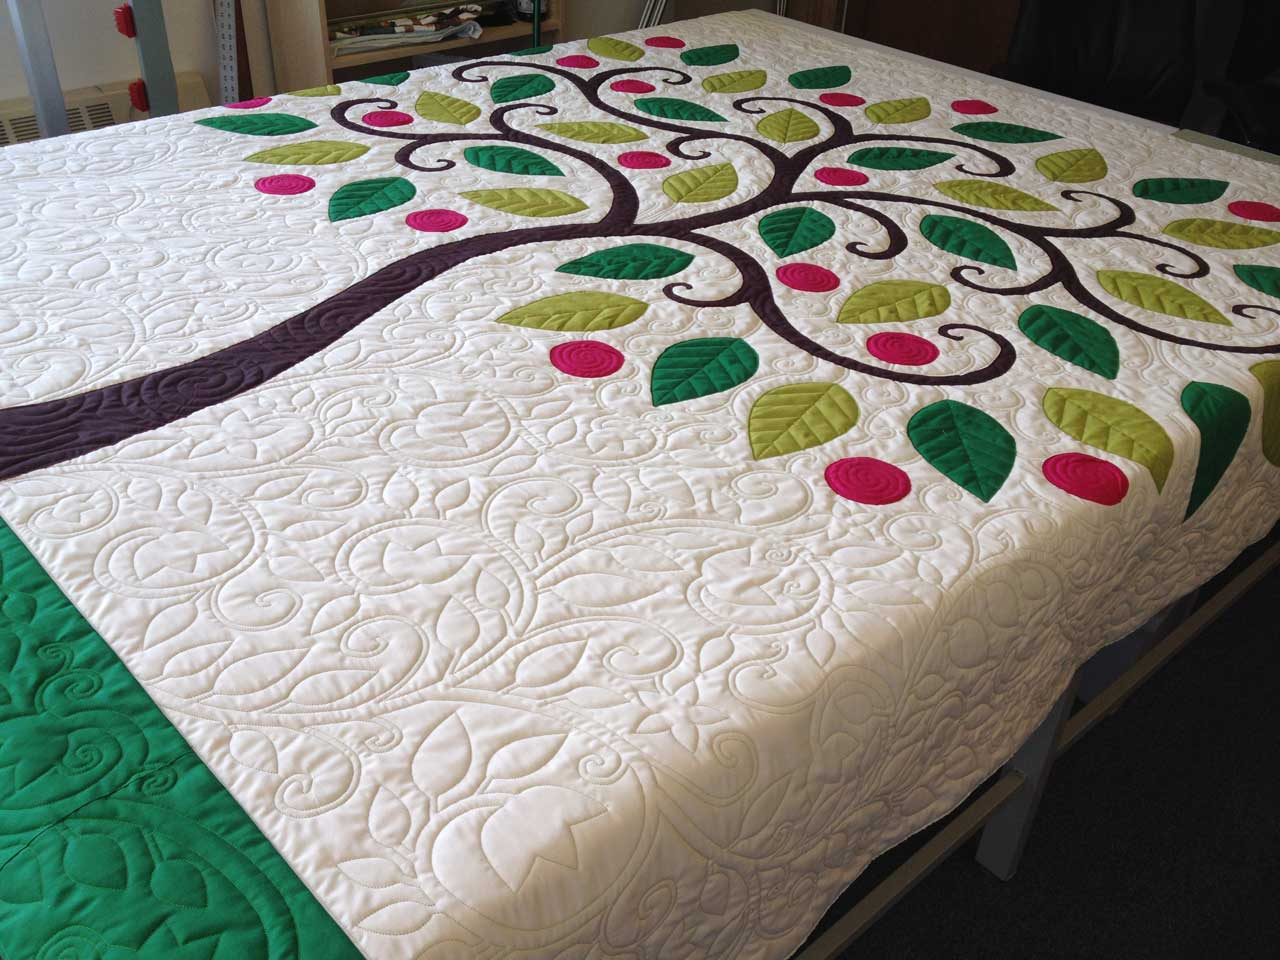 Applique designs for tablecloth - Tree Applique Quilt